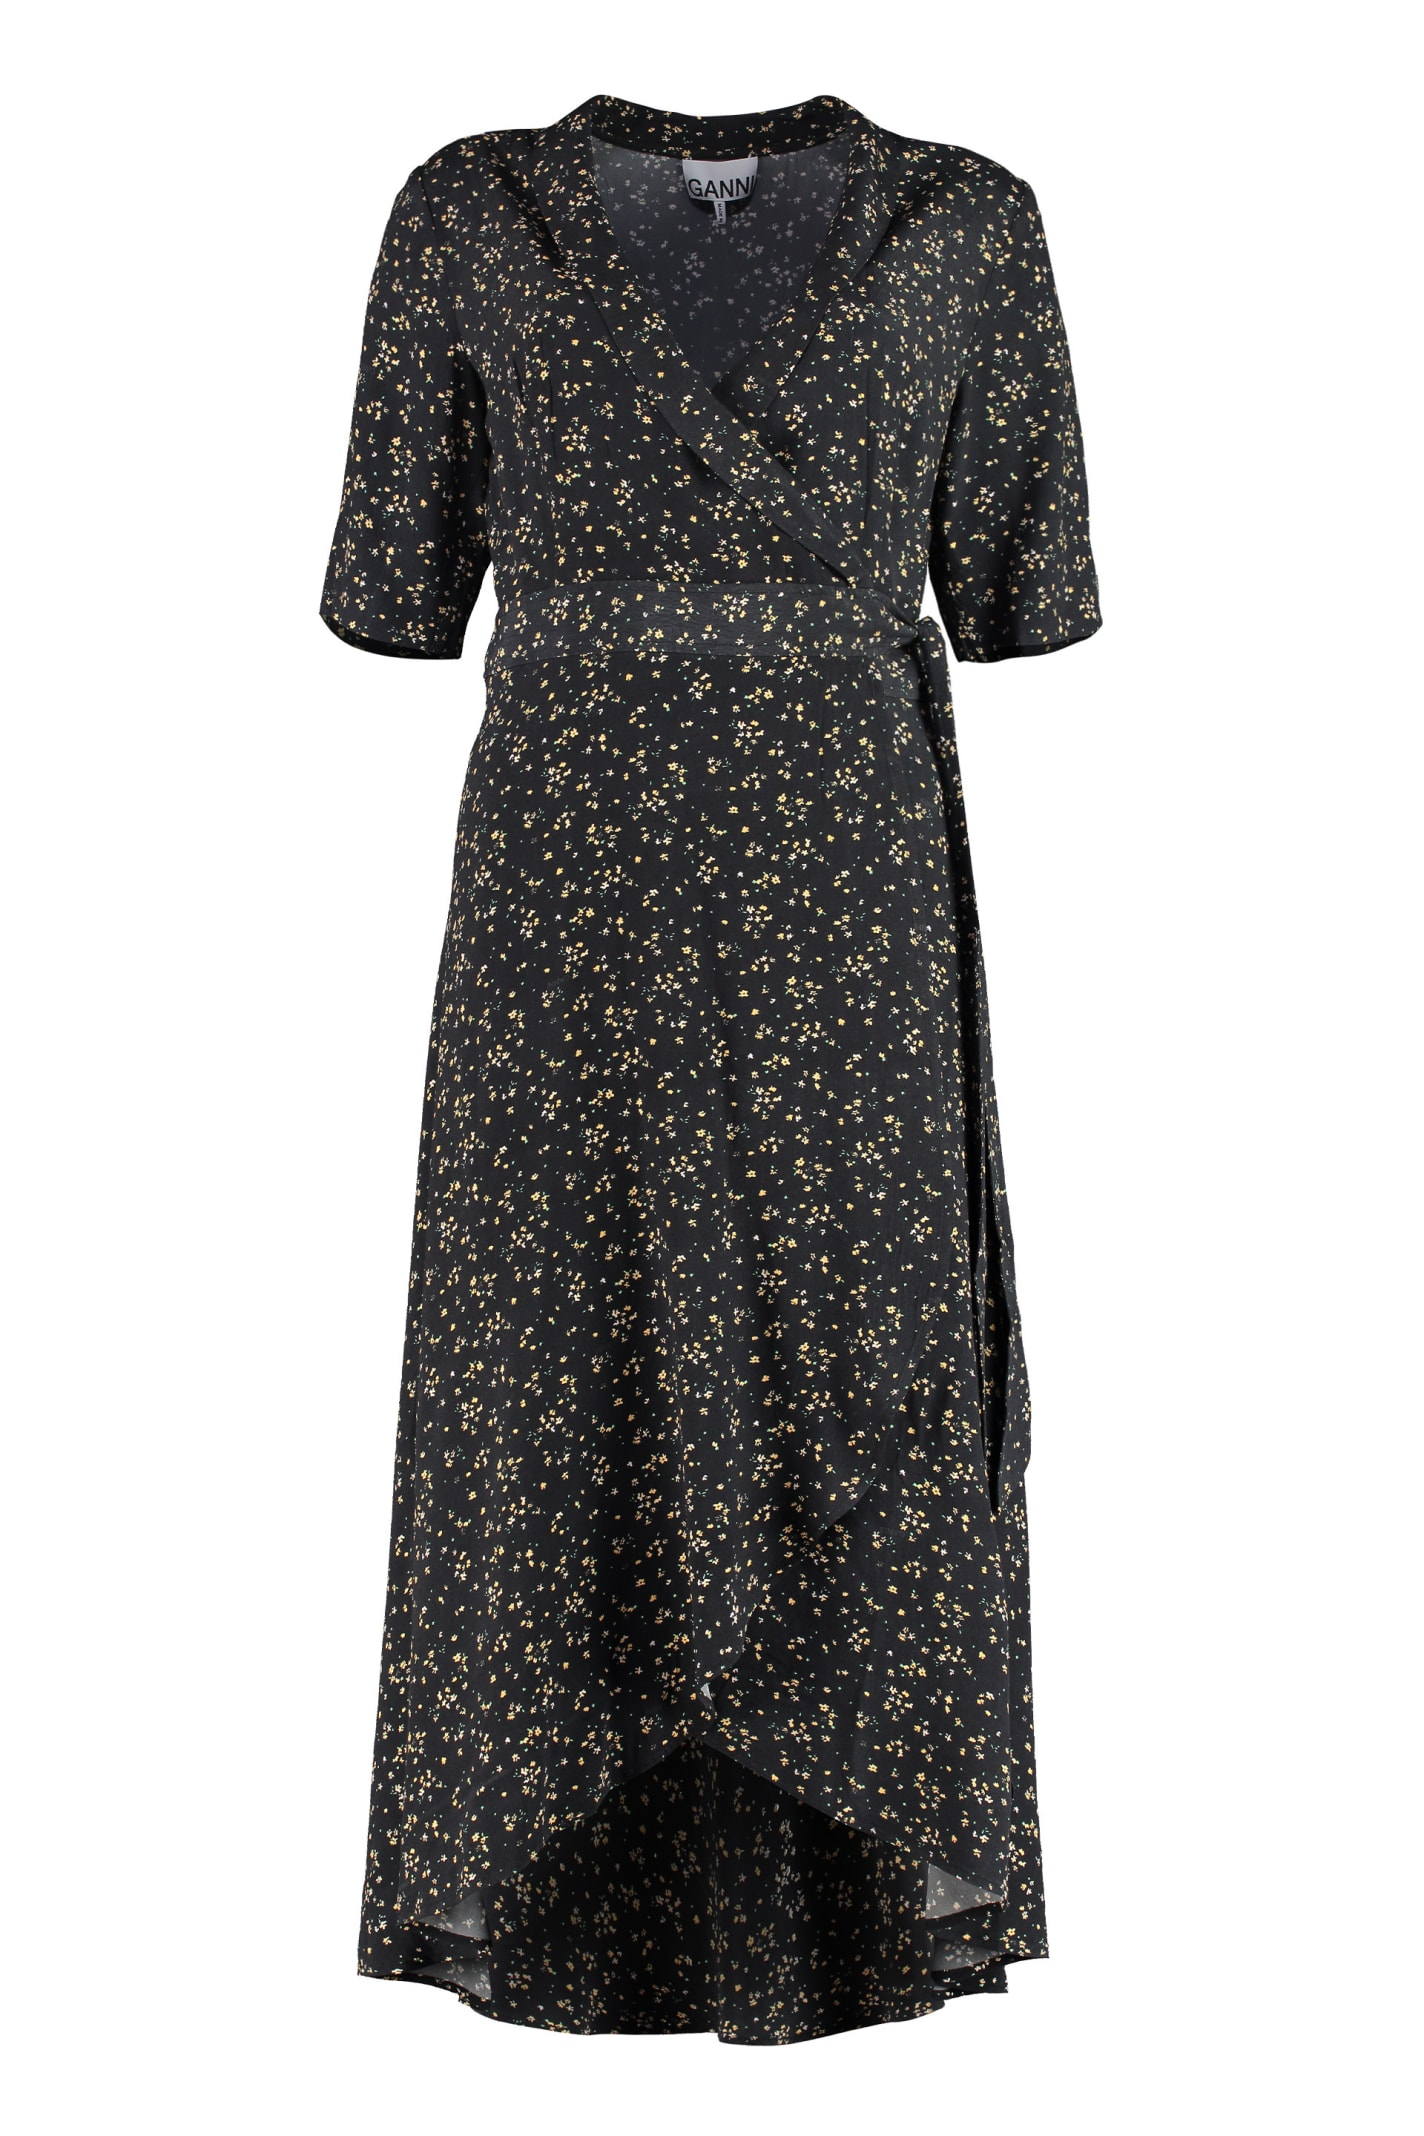 Buy Ganni Wrap-dress online, shop Ganni with free shipping